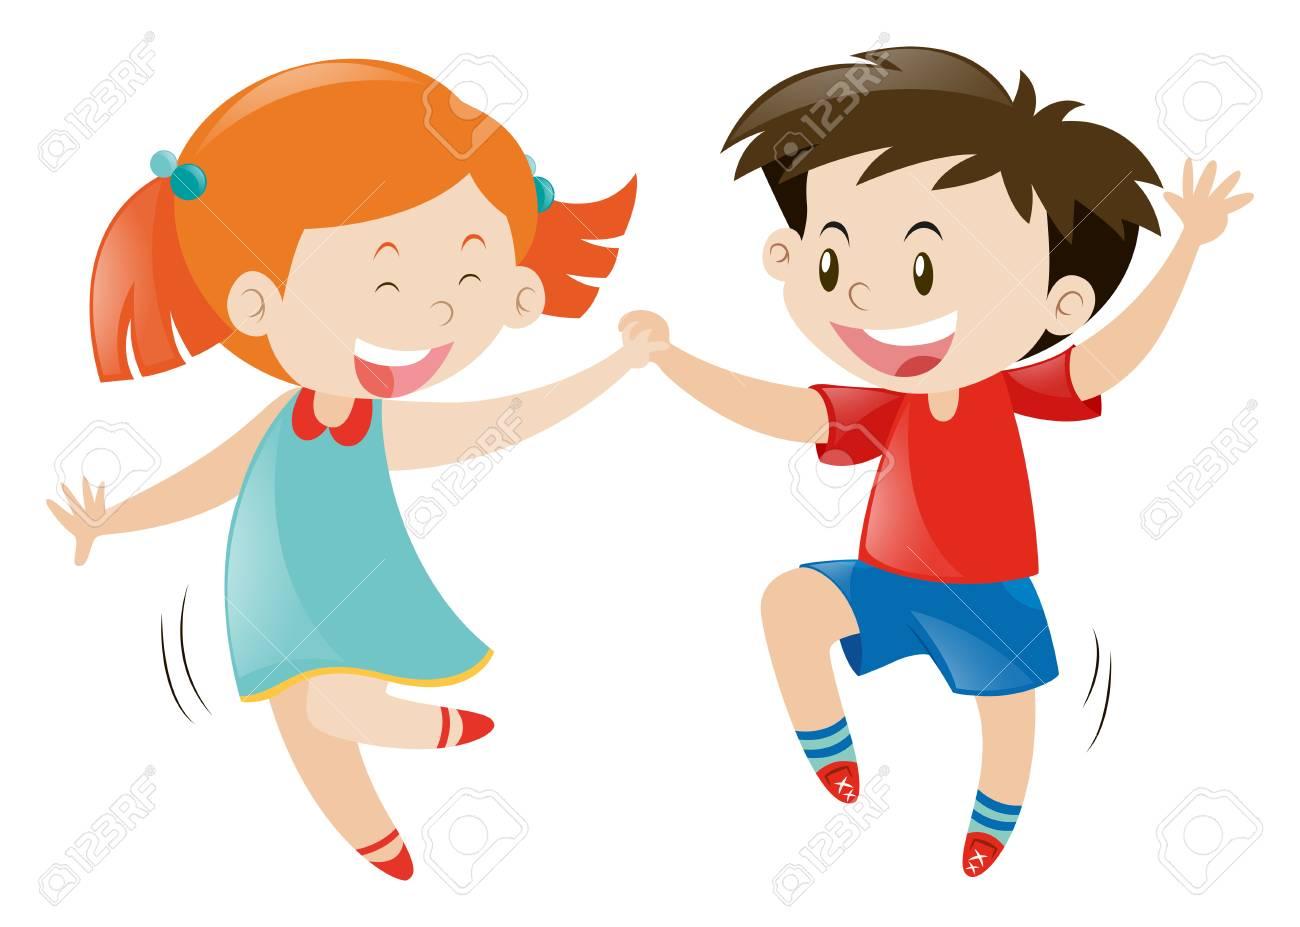 Happy boy and girl dancing illustration.